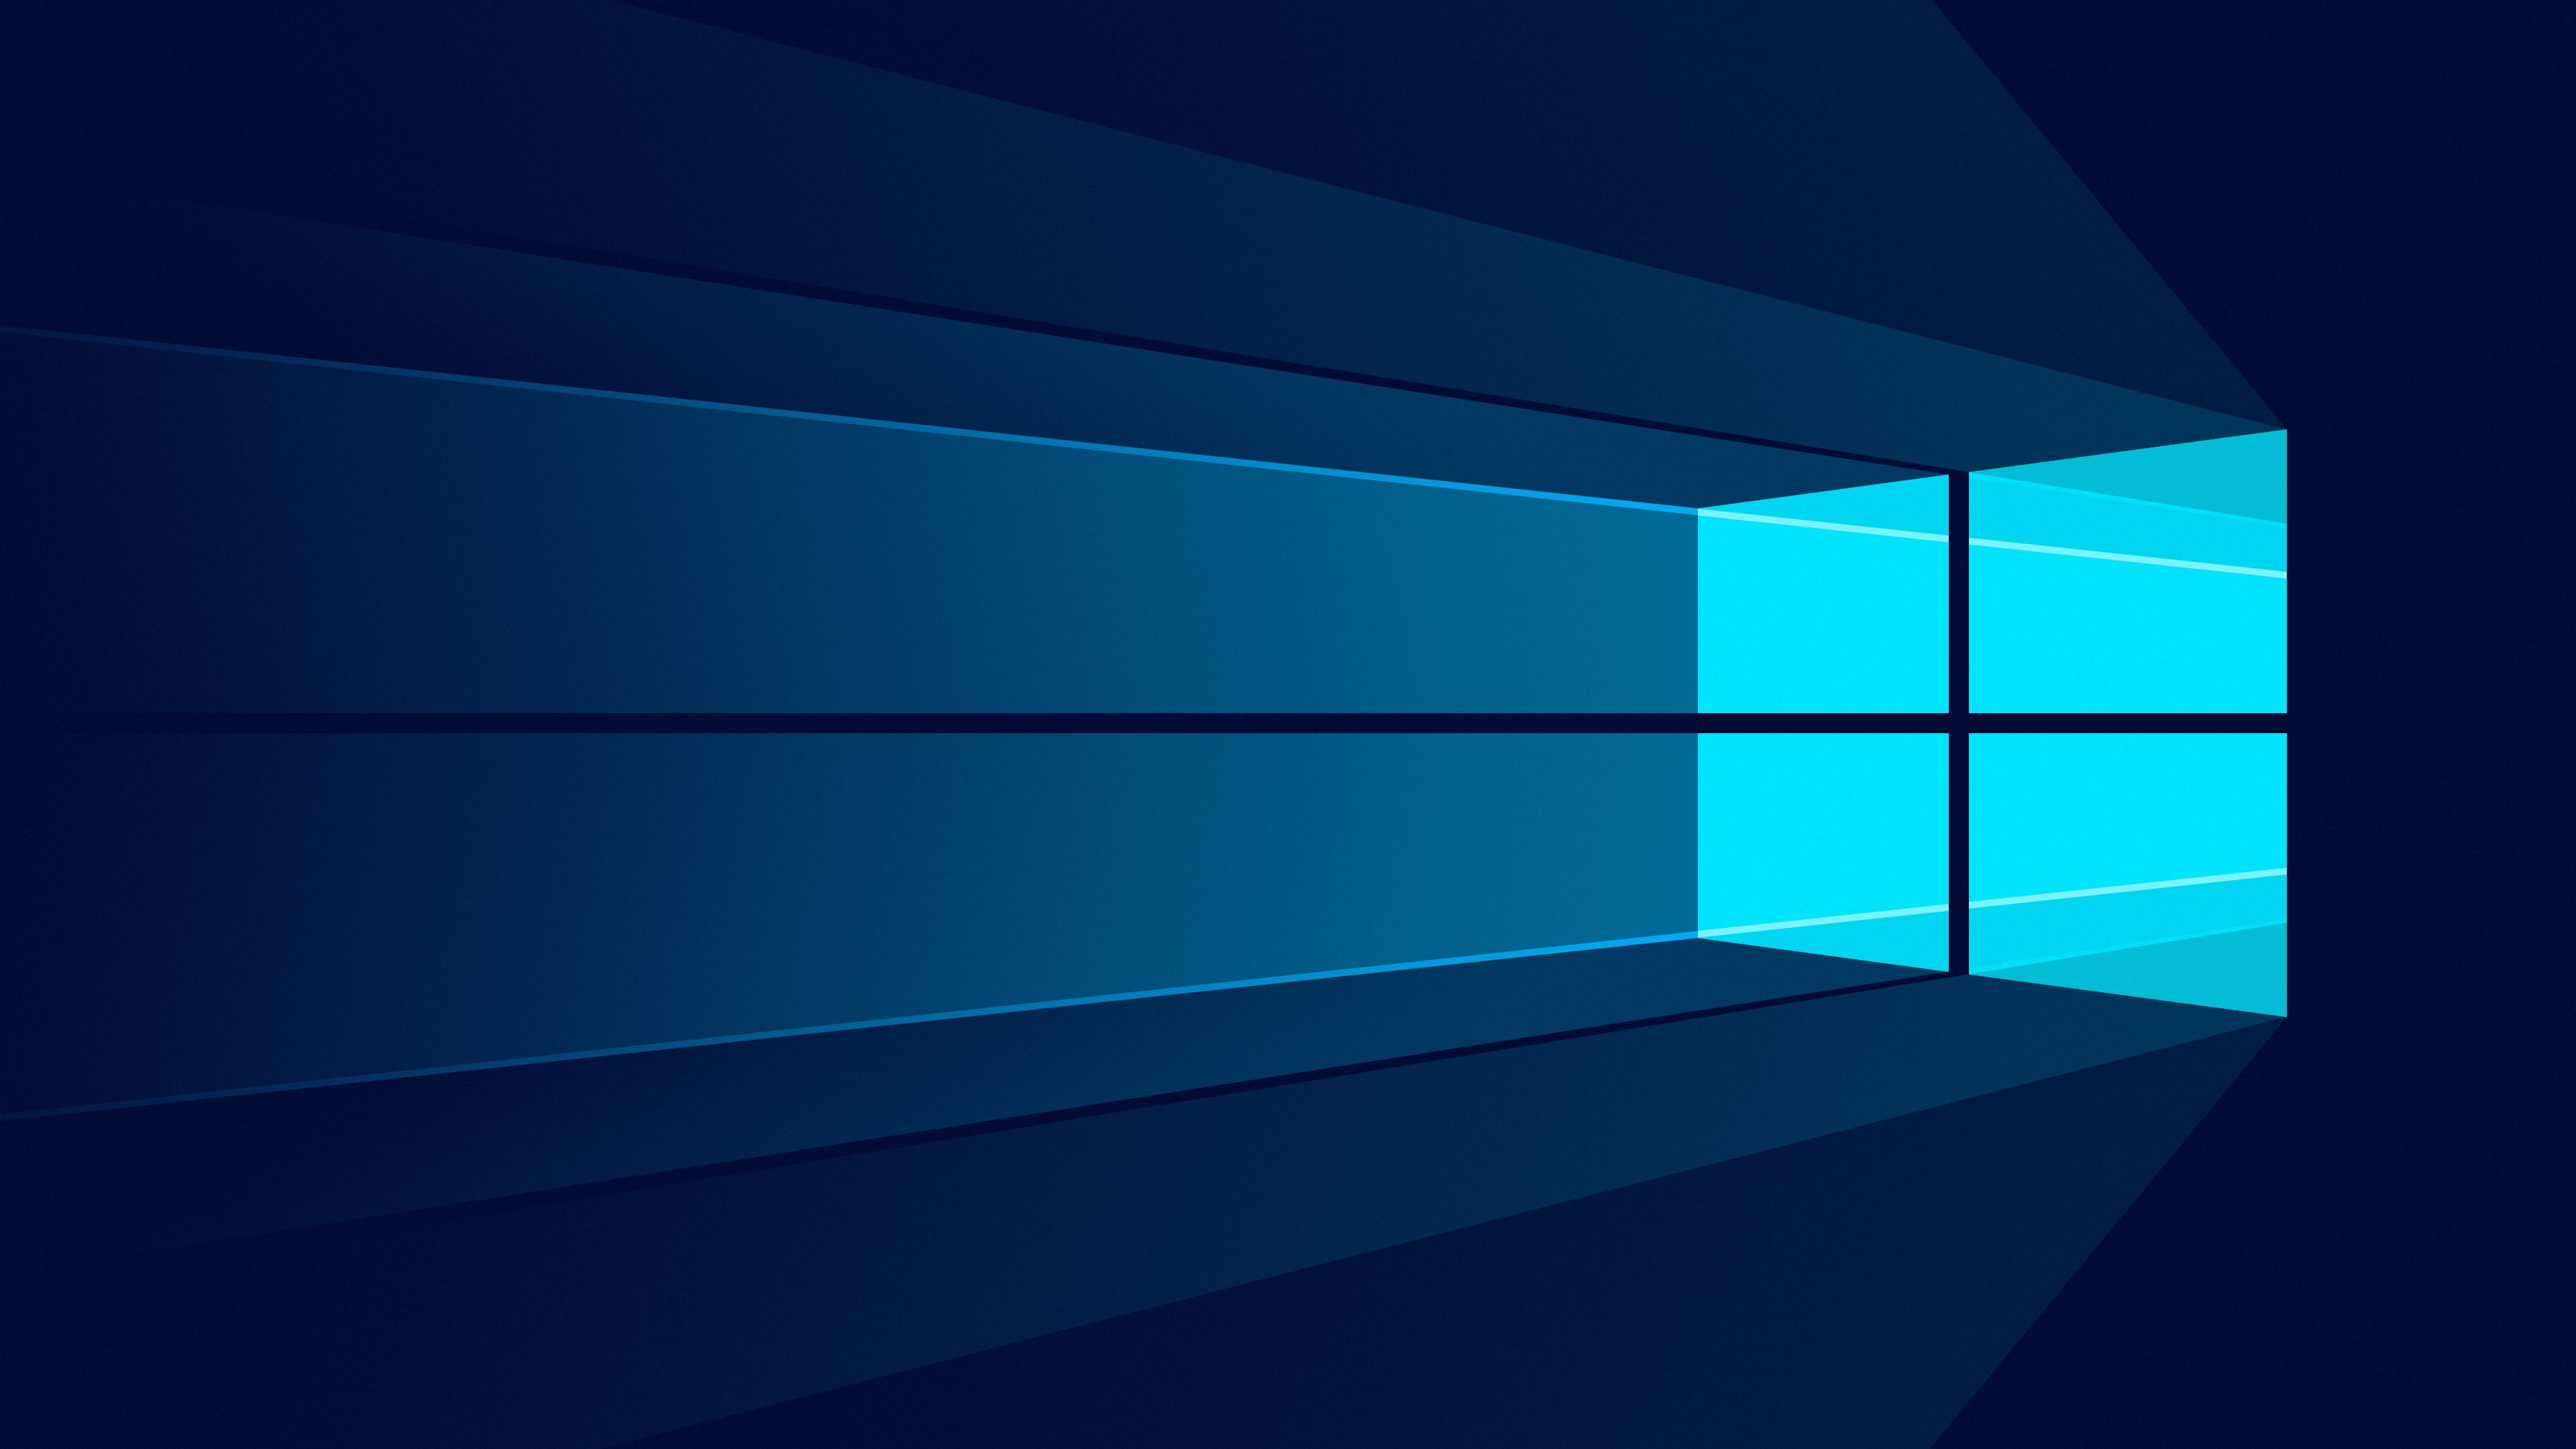 Windows 10 Minimalist, HD Computer, 4k Wallpapers, Images ...